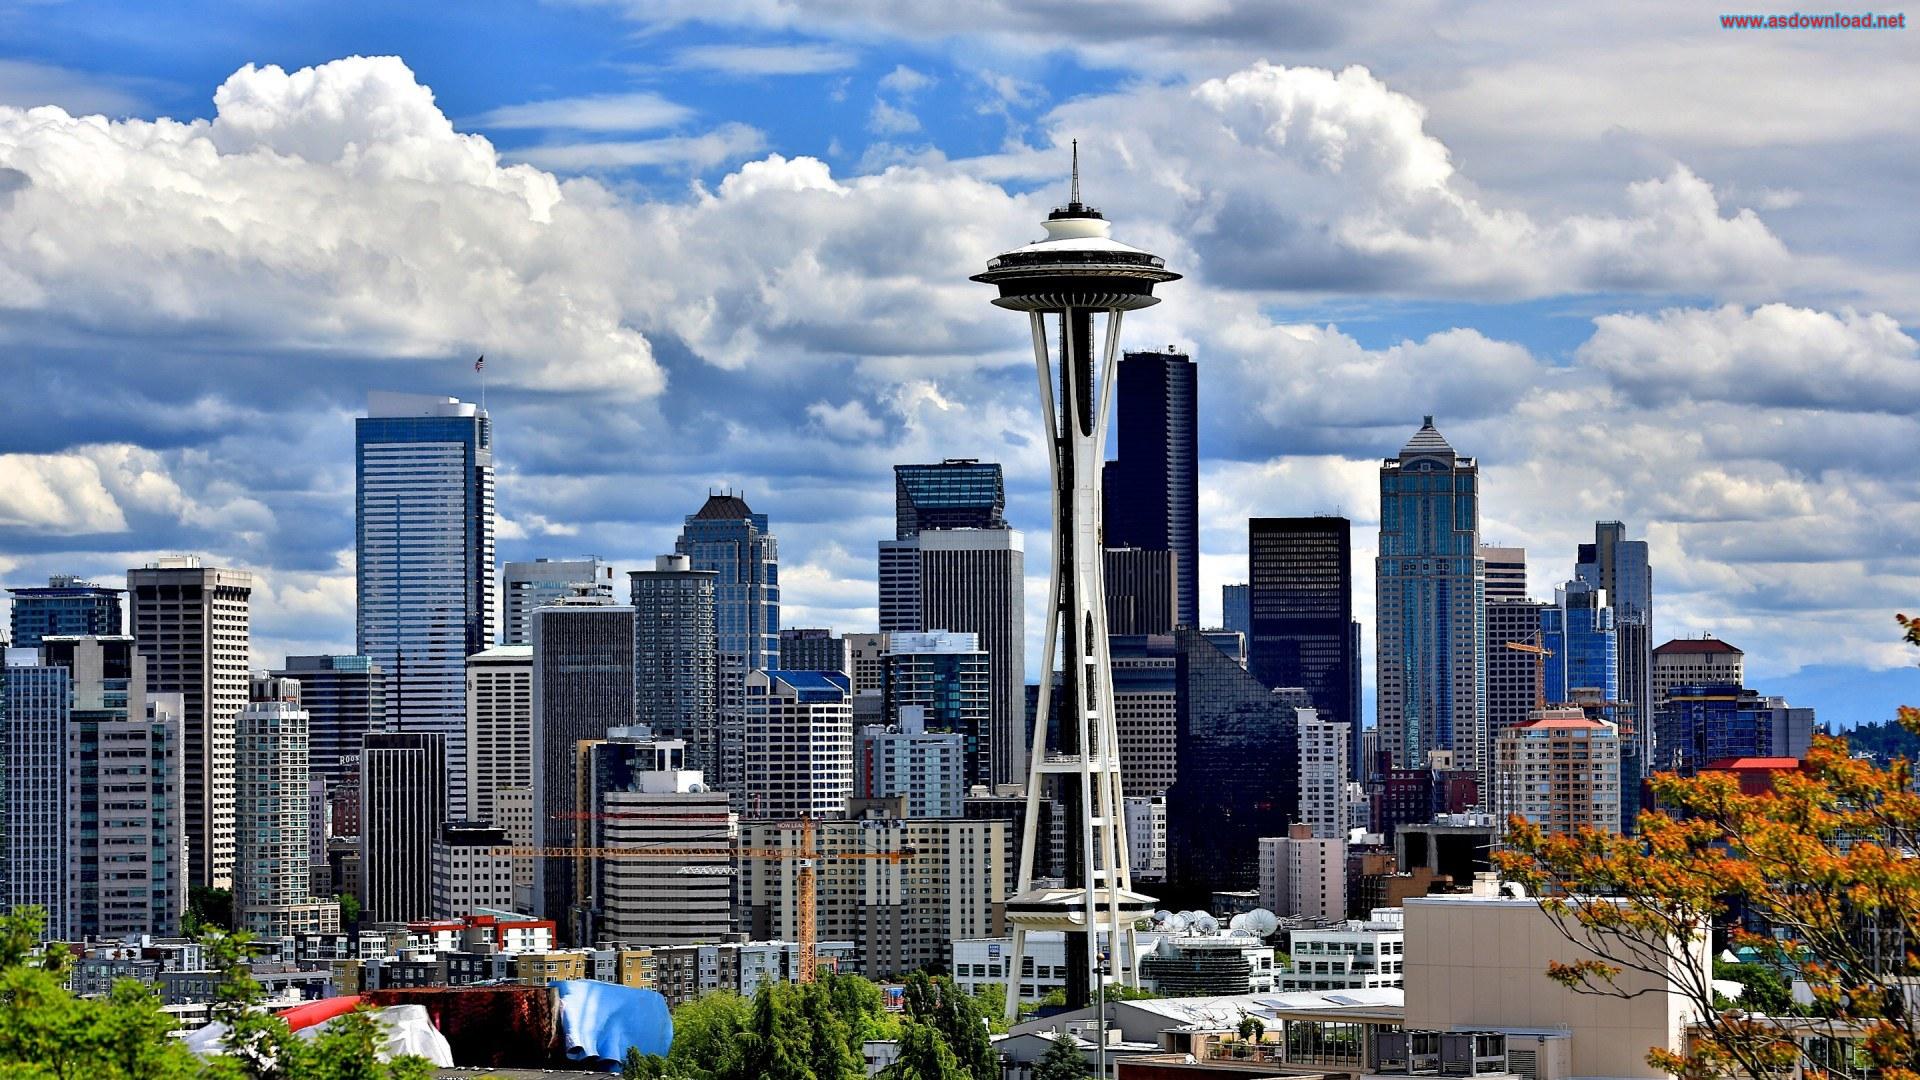 Seattle-Washington-Free-Desktop-Wallpaper